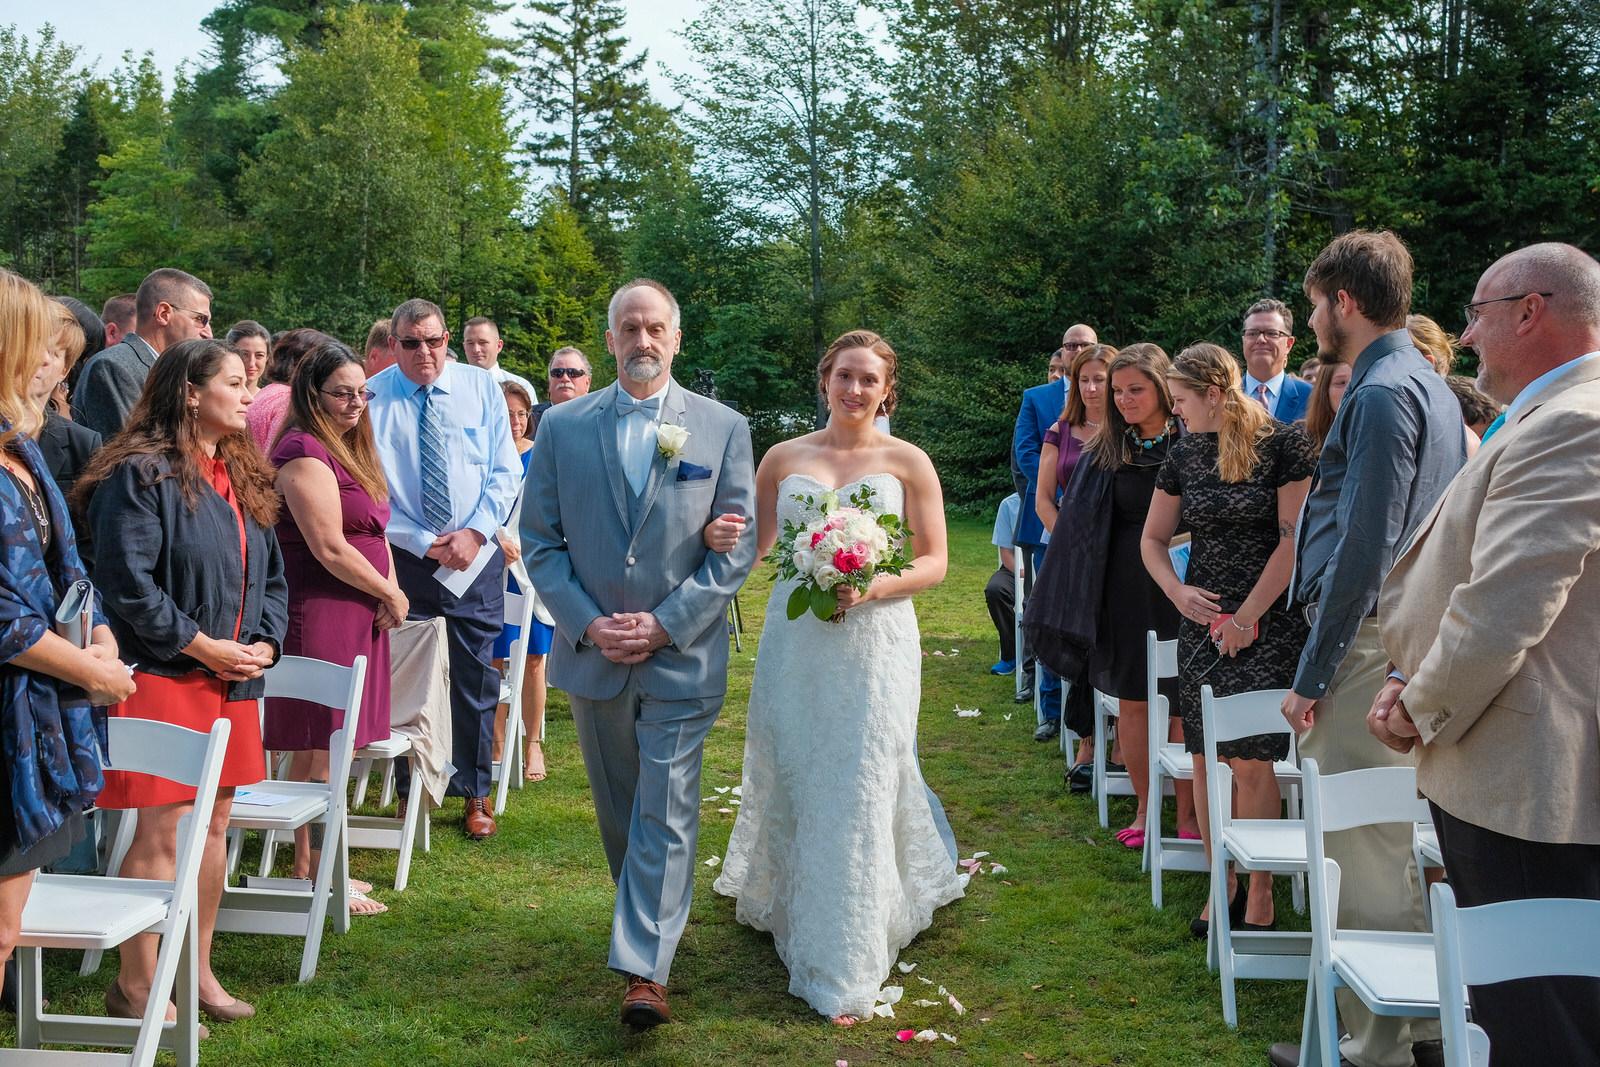 waterville-valley-wedding-photography-494.jpg